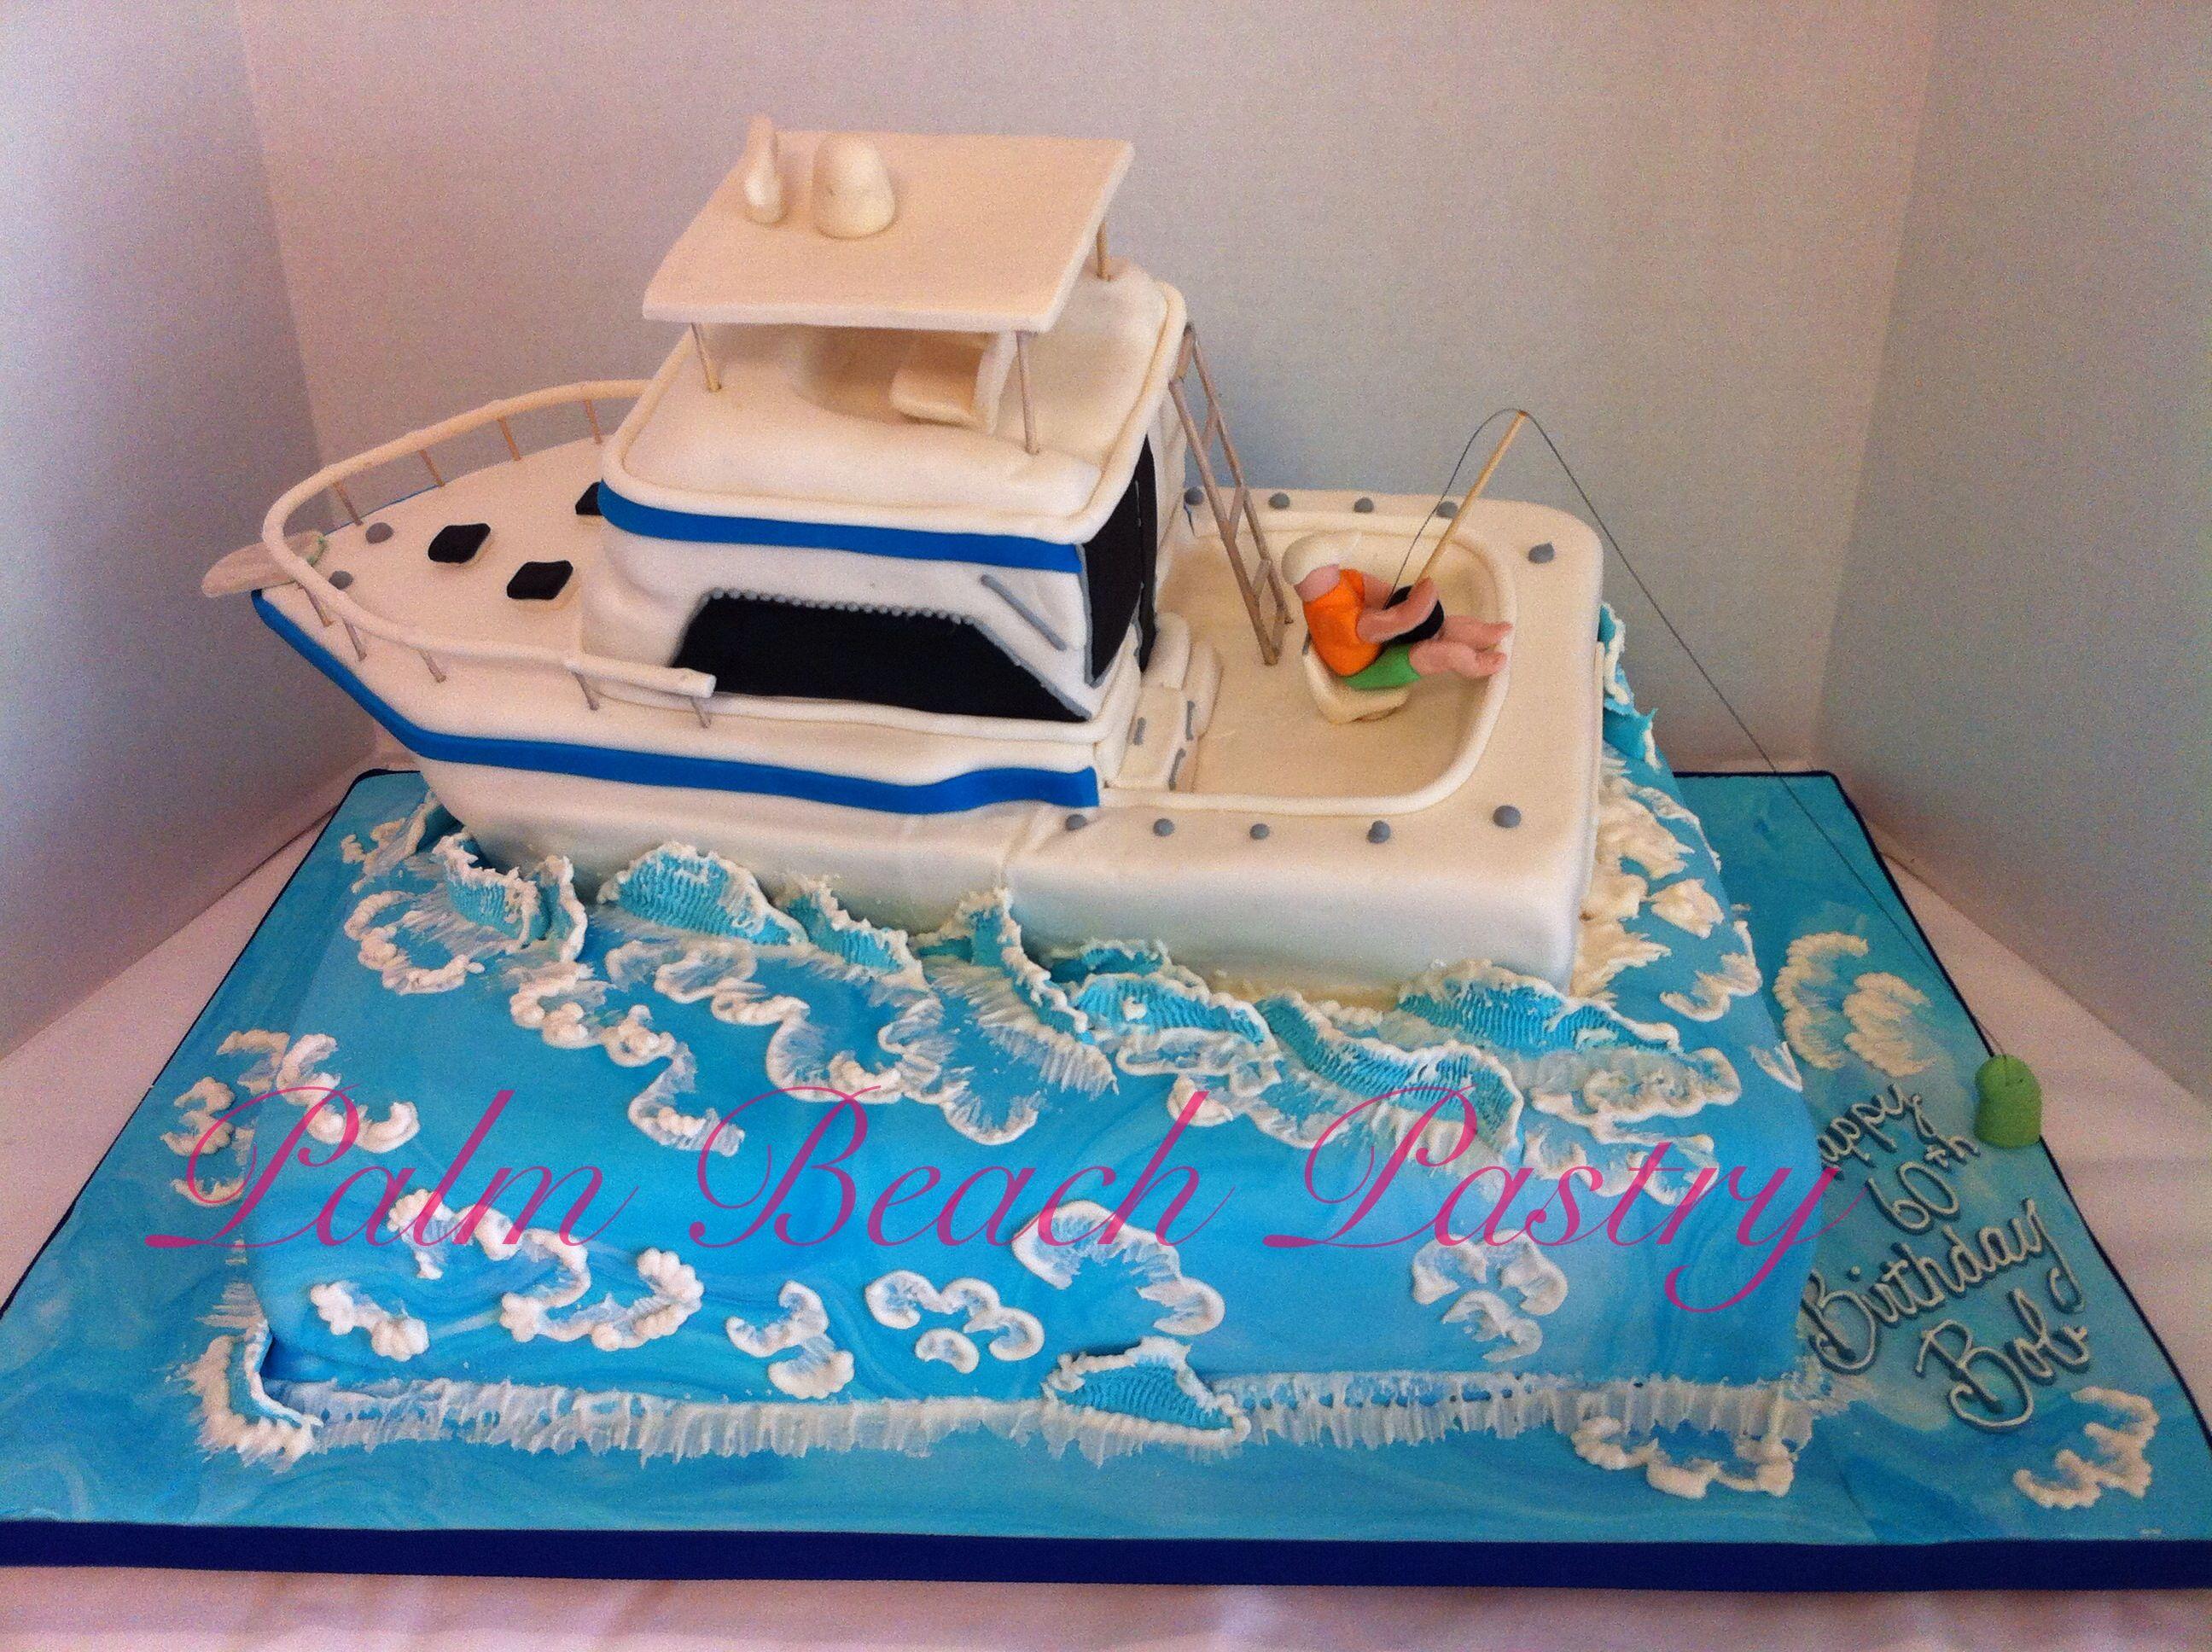 Fishing Boat Cake On The Rough Seas My Cakes Pinterest Boat - Boat birthday cake ideas